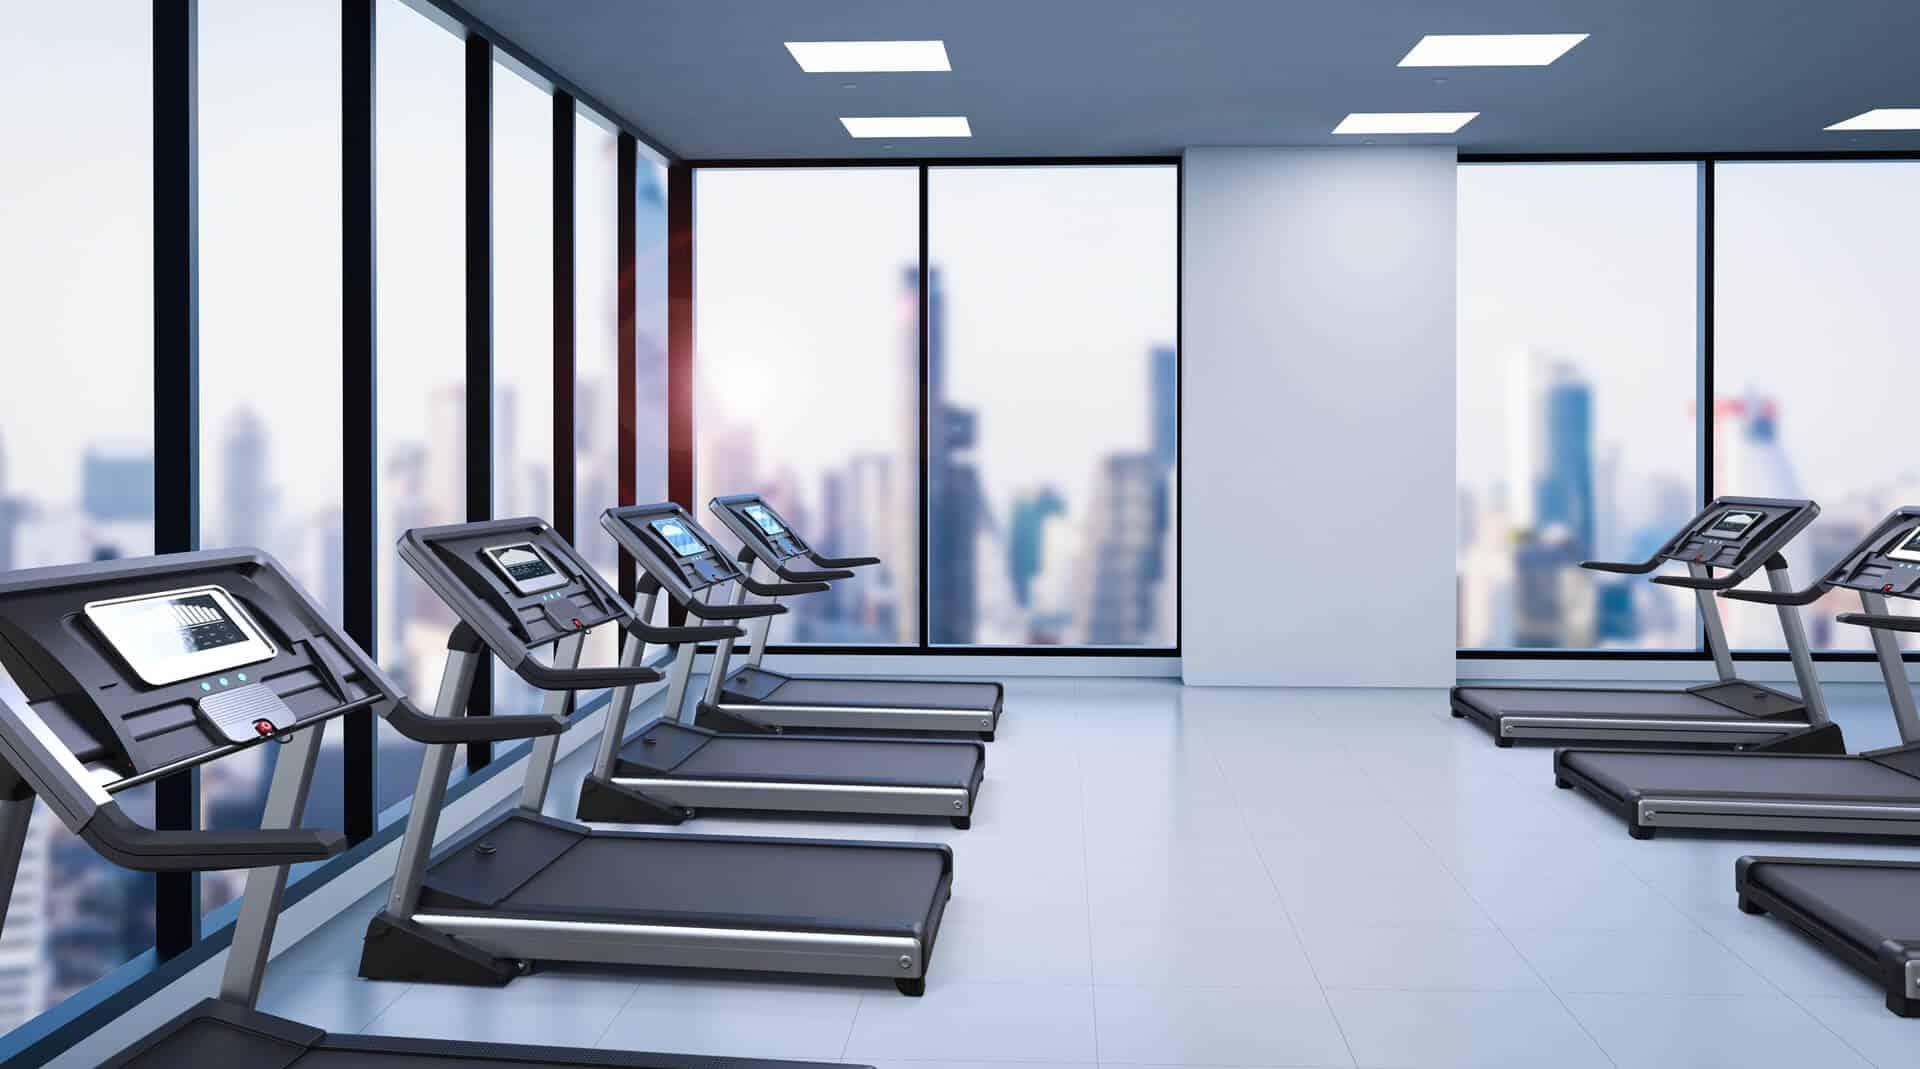 treadmill york or vo2